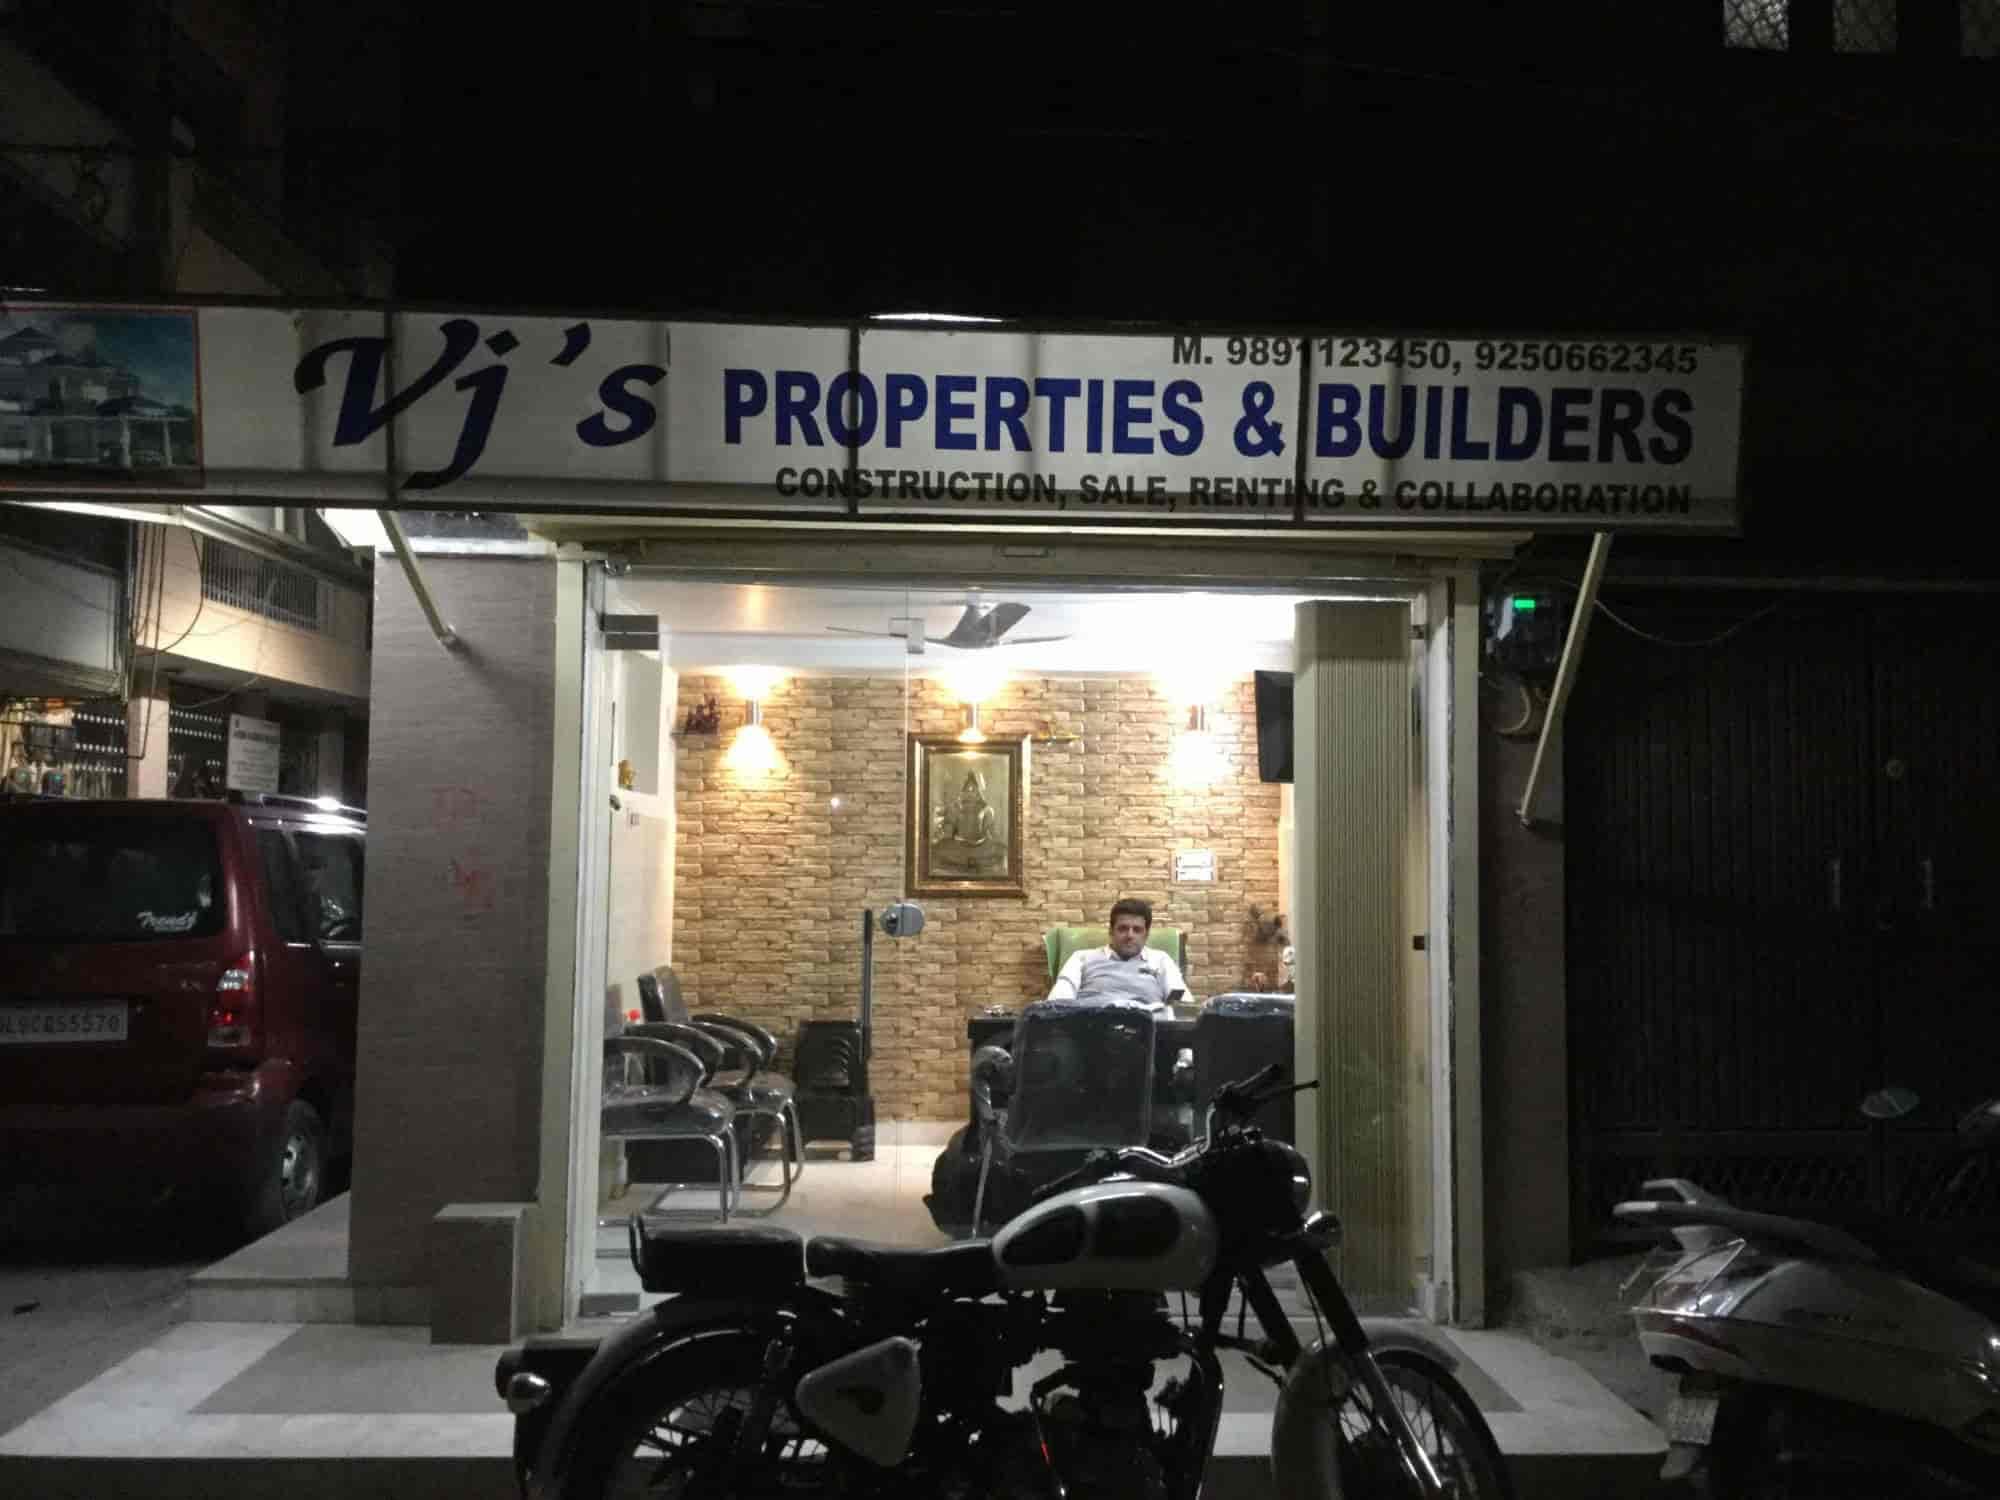 Vj s Properties Tilak Nagar Property Dealers in Delhi Justdial